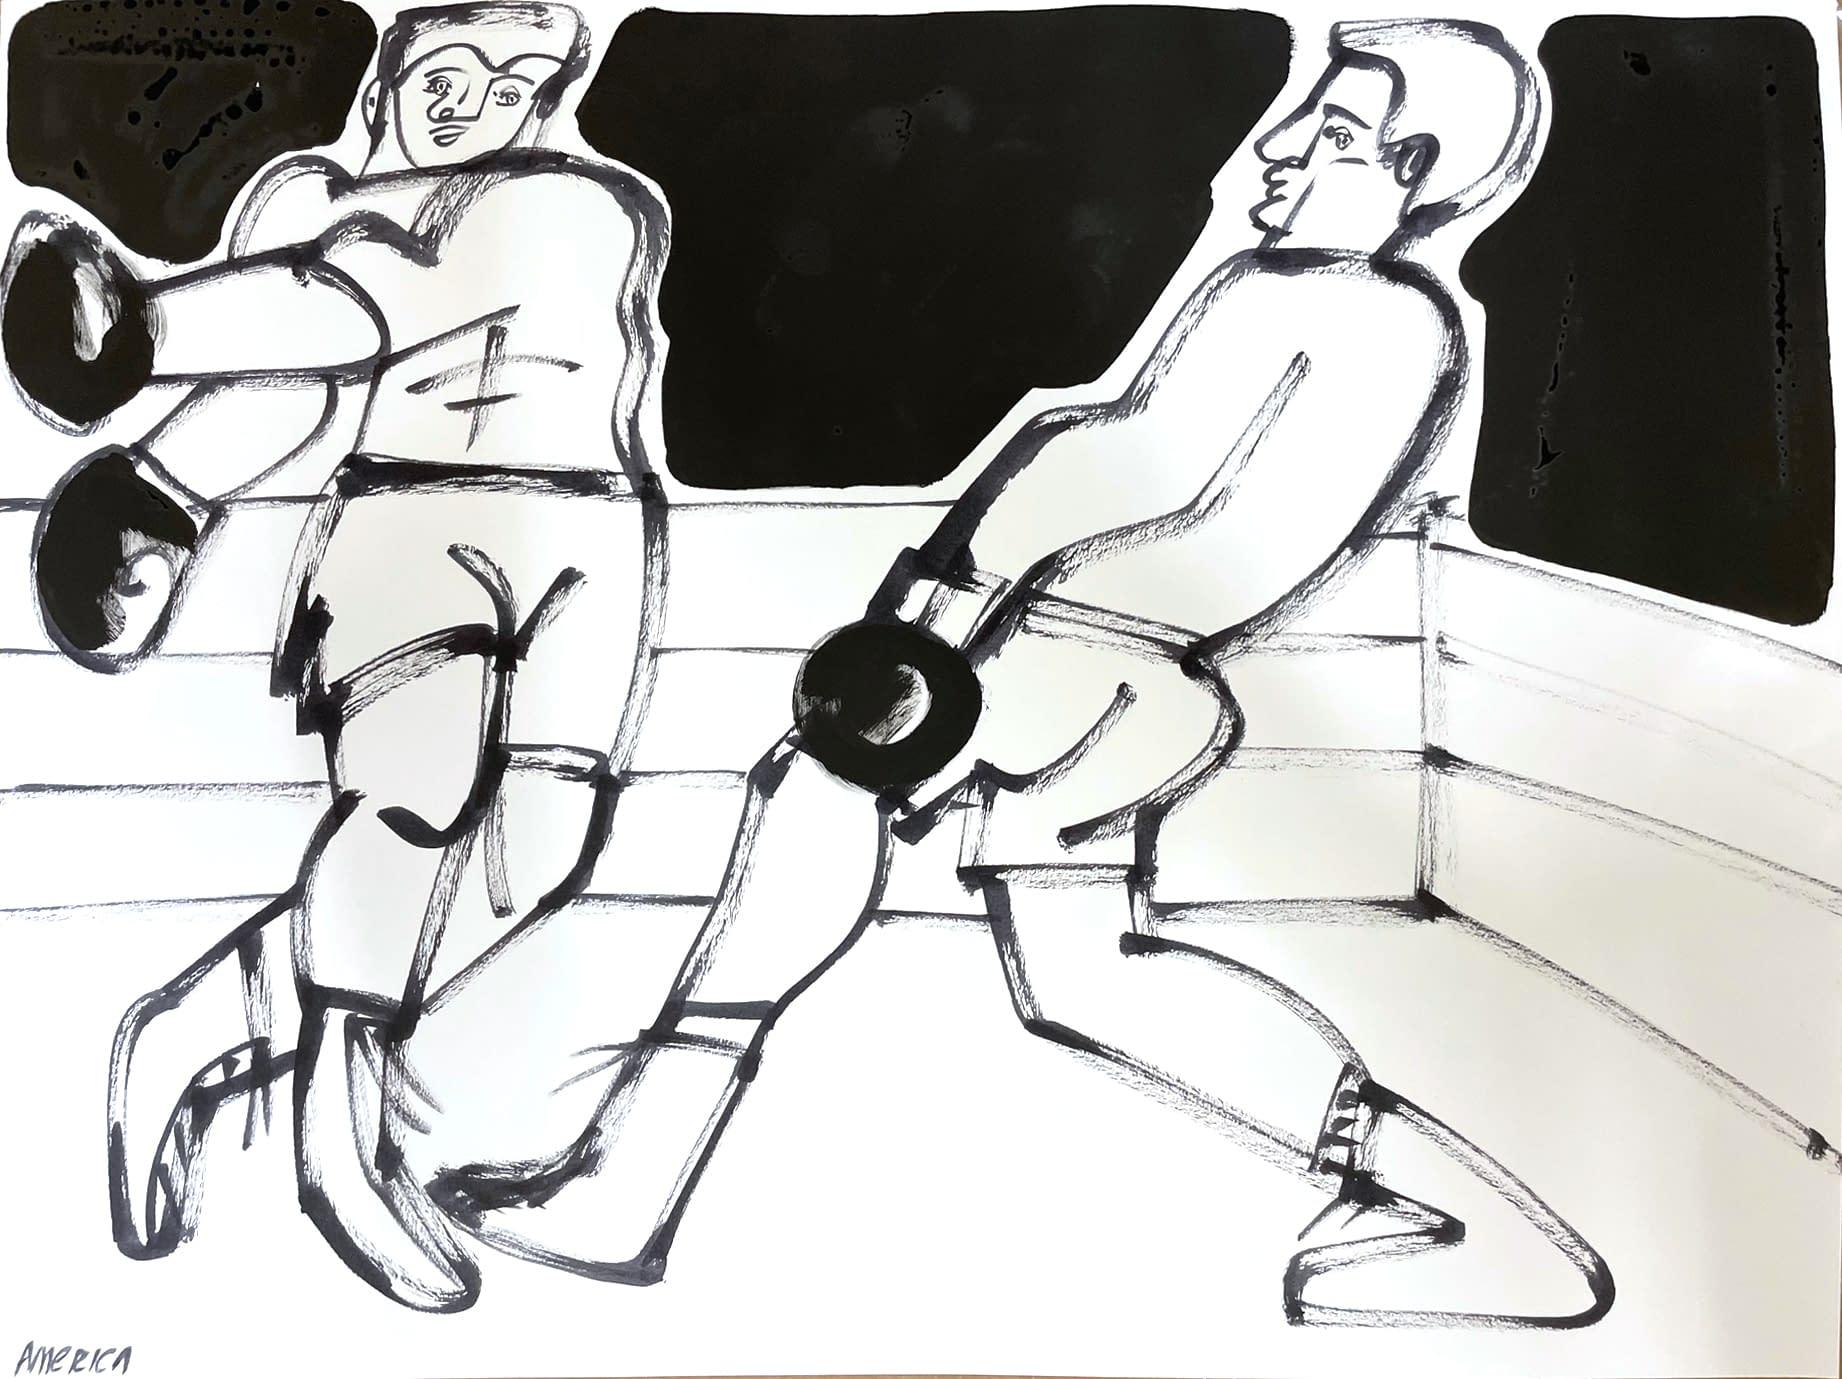 boxer ii, america martin, ink on paper, black and white figurative